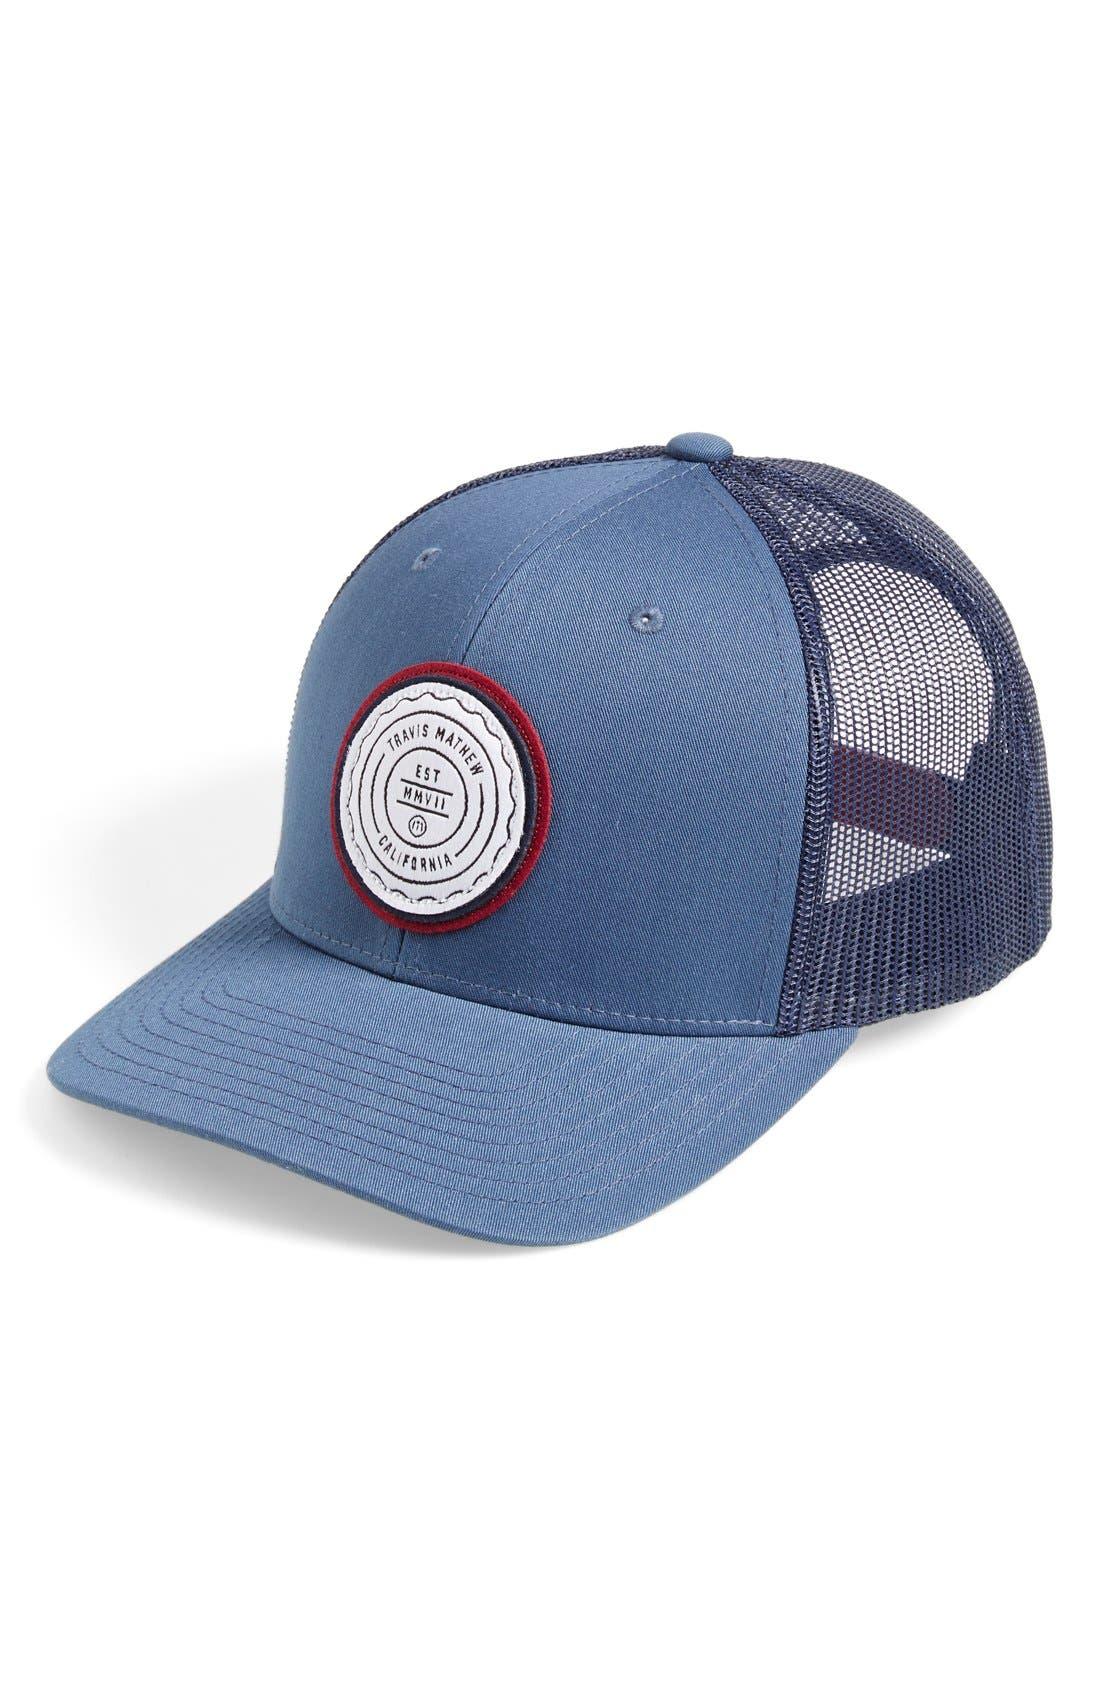 Main Image - Travis Mathew 'Fringe' Trucker Hat